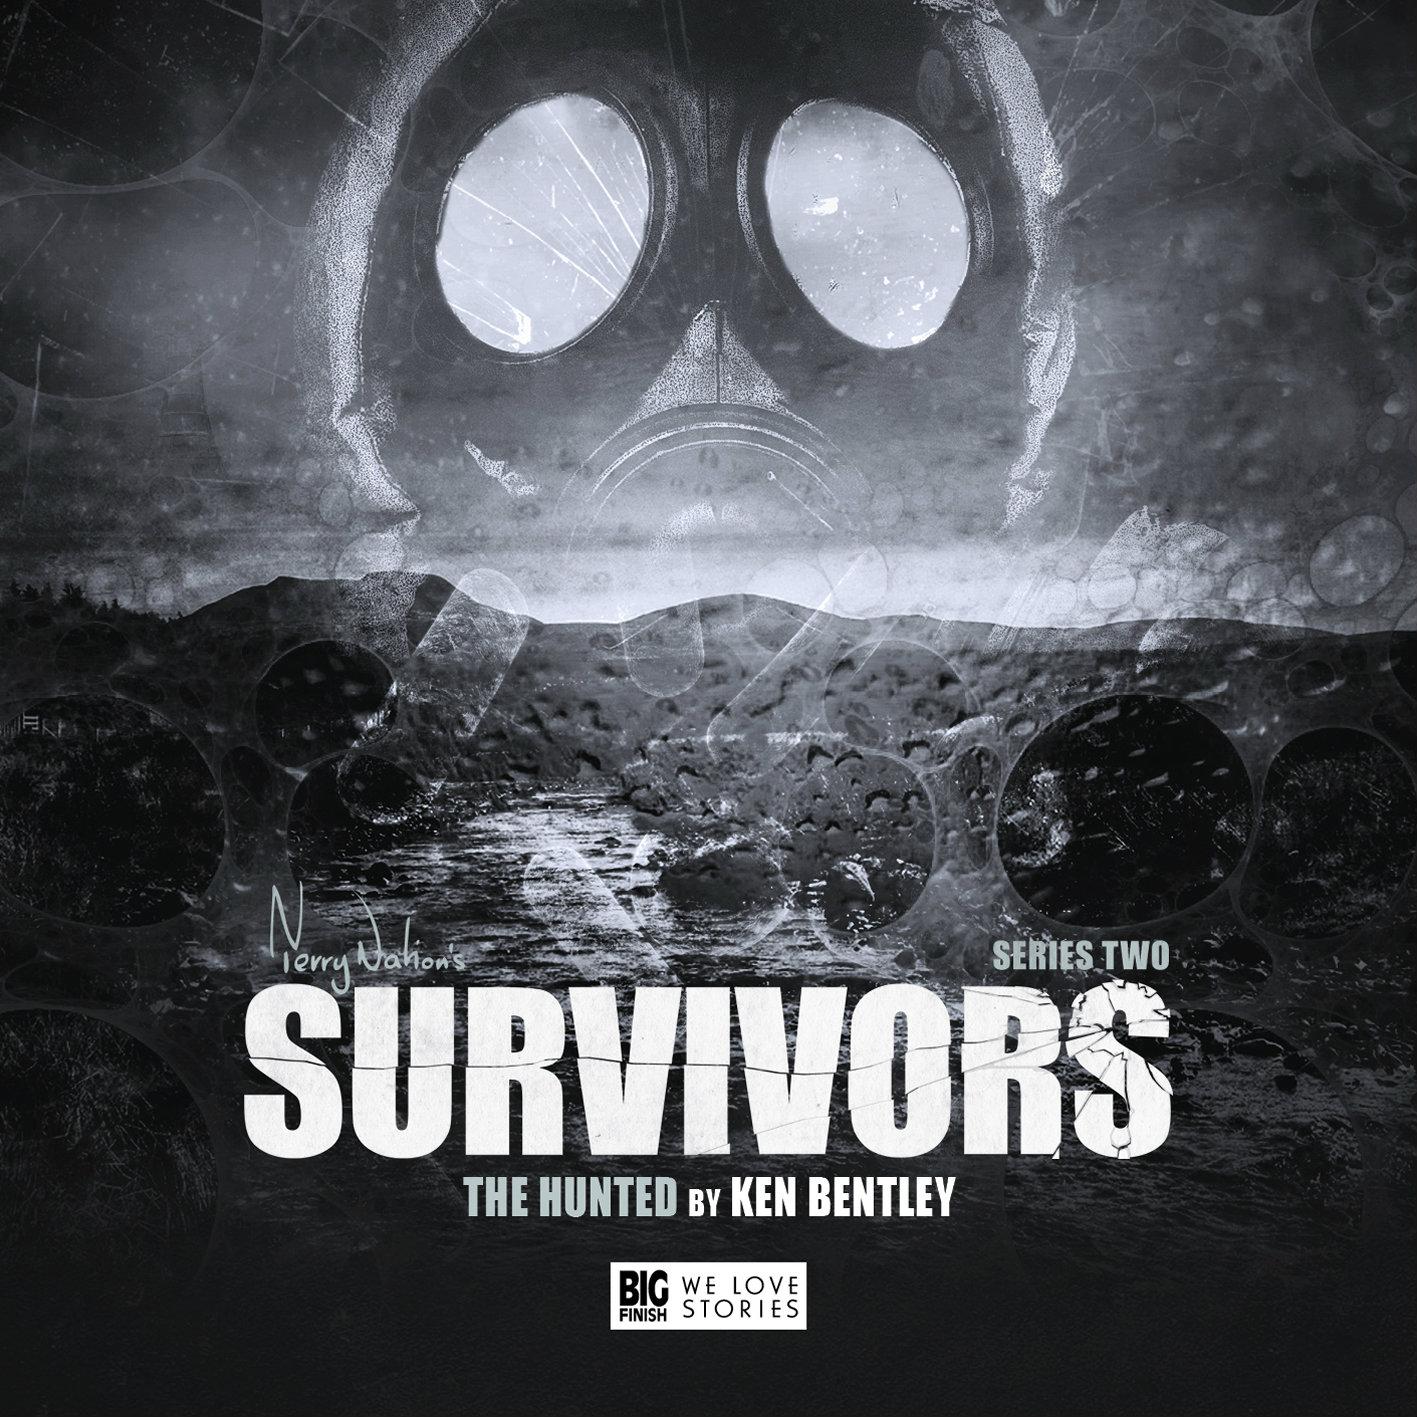 Episode image for Survivors 2:3 The Hunted